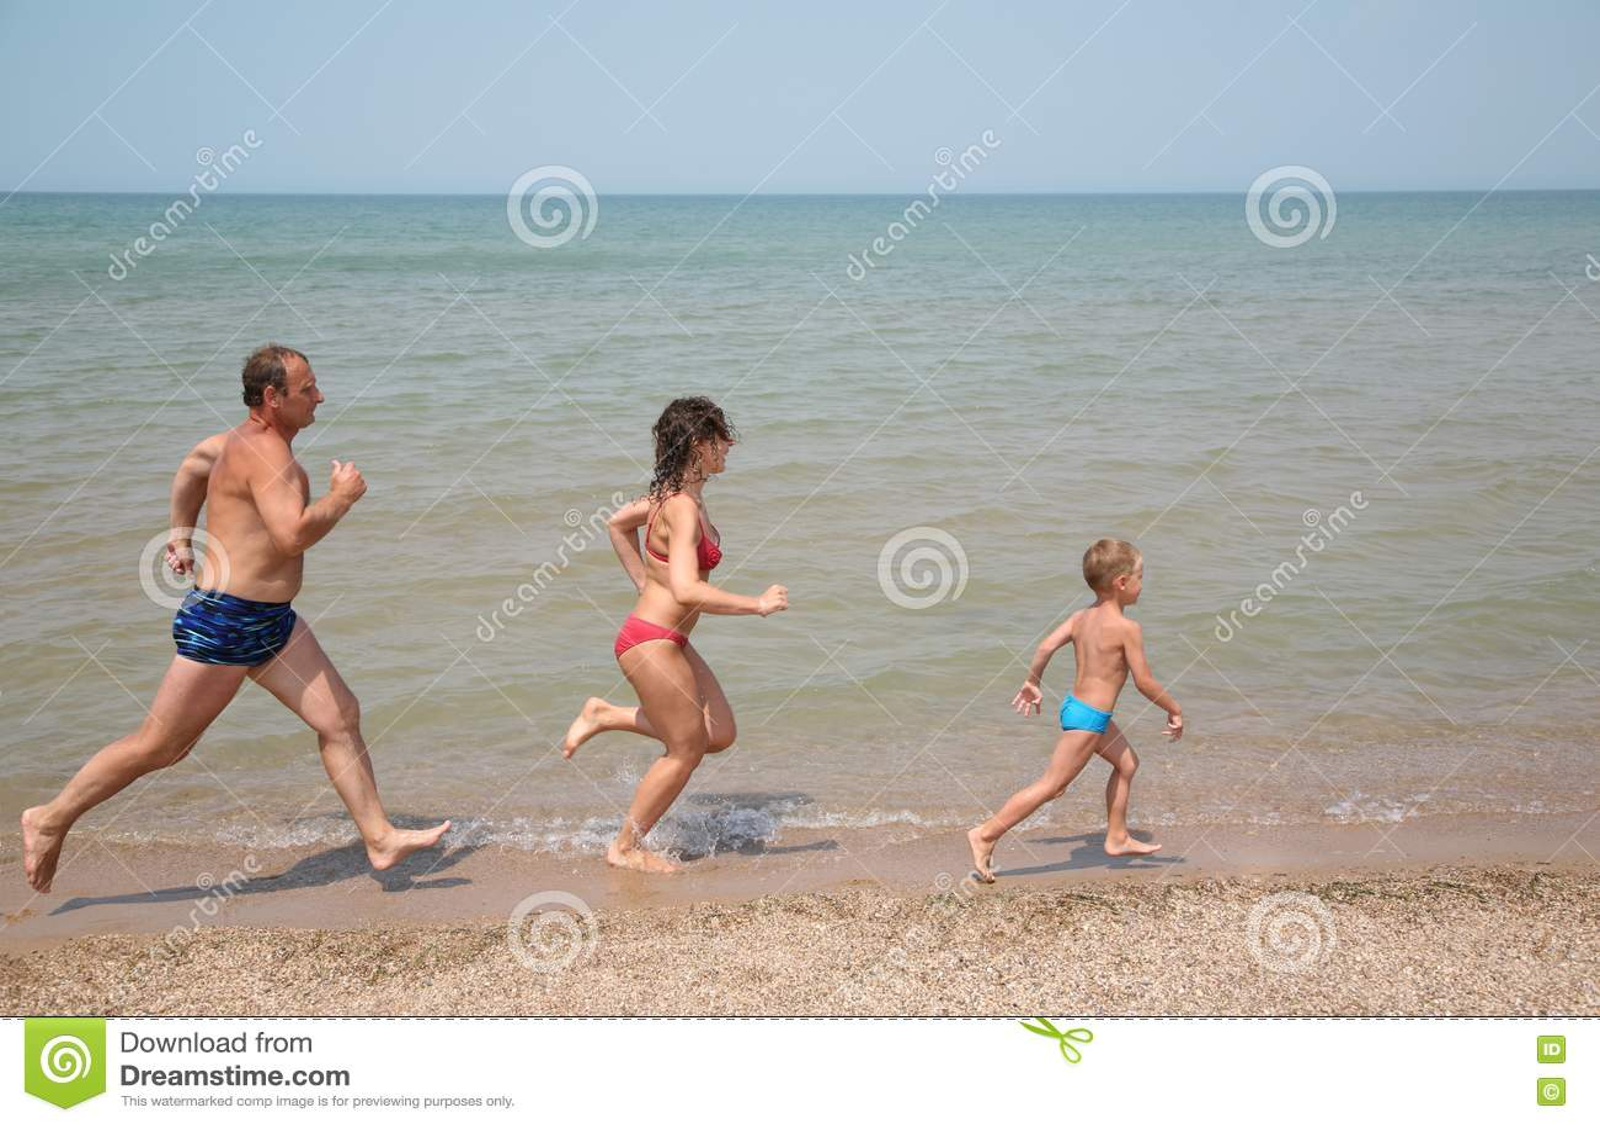 3bdba76f616 Free Stock Image  Run As To Beach Picture. Image  2951956